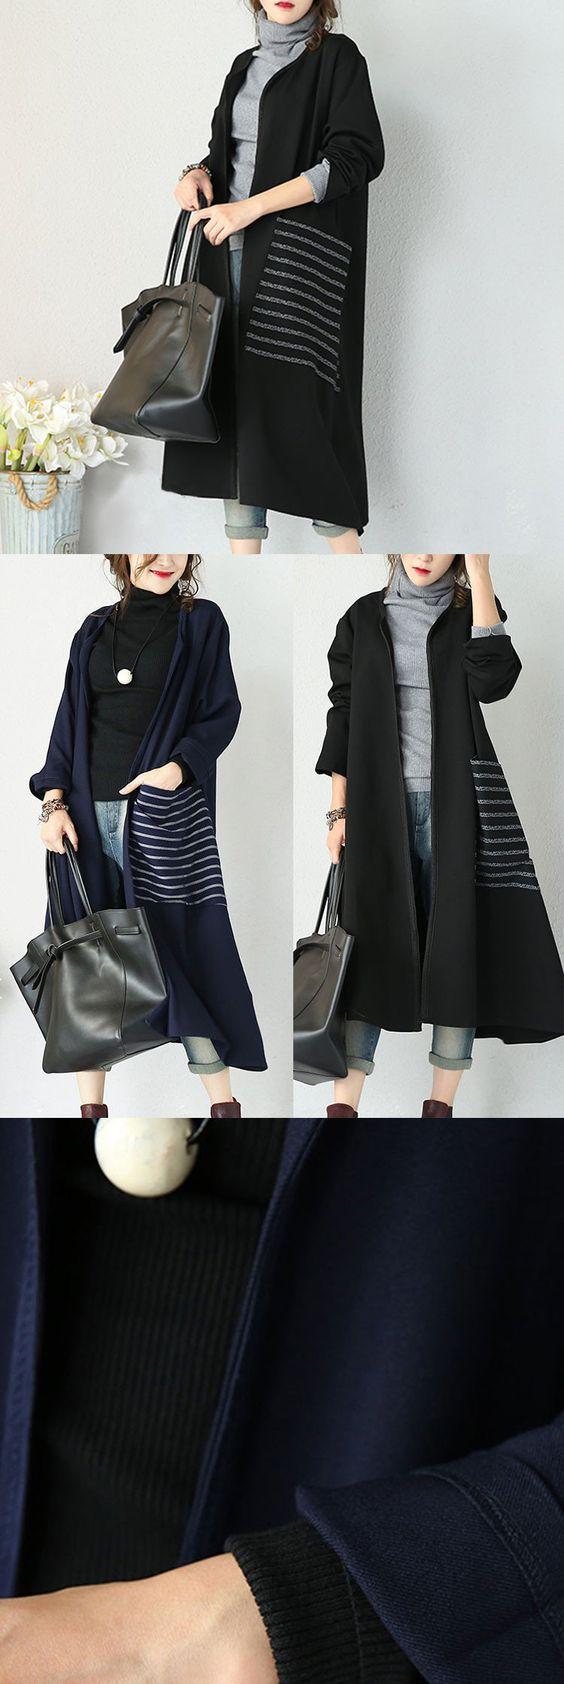 Black Stretch Cotton Casual Coat